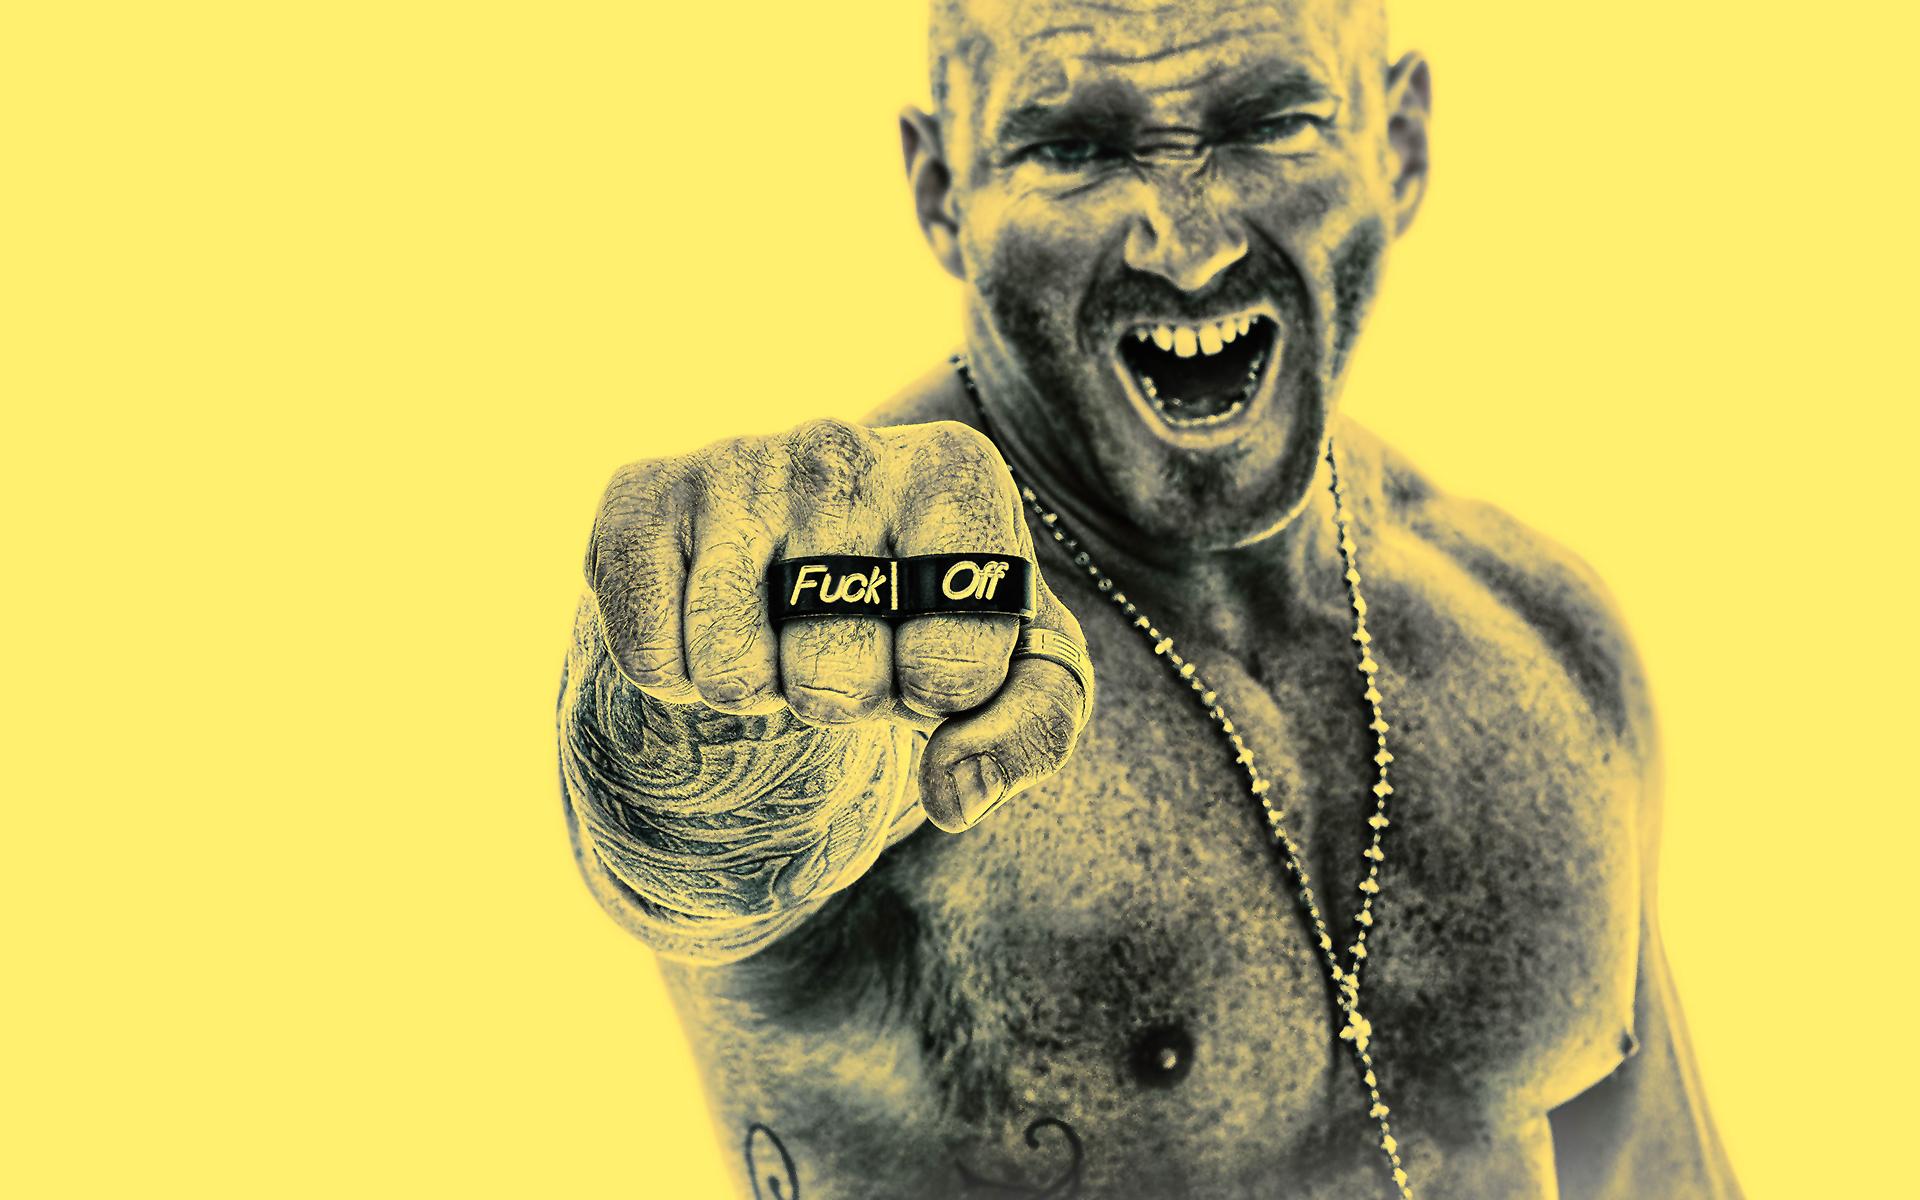 Fuck off fist